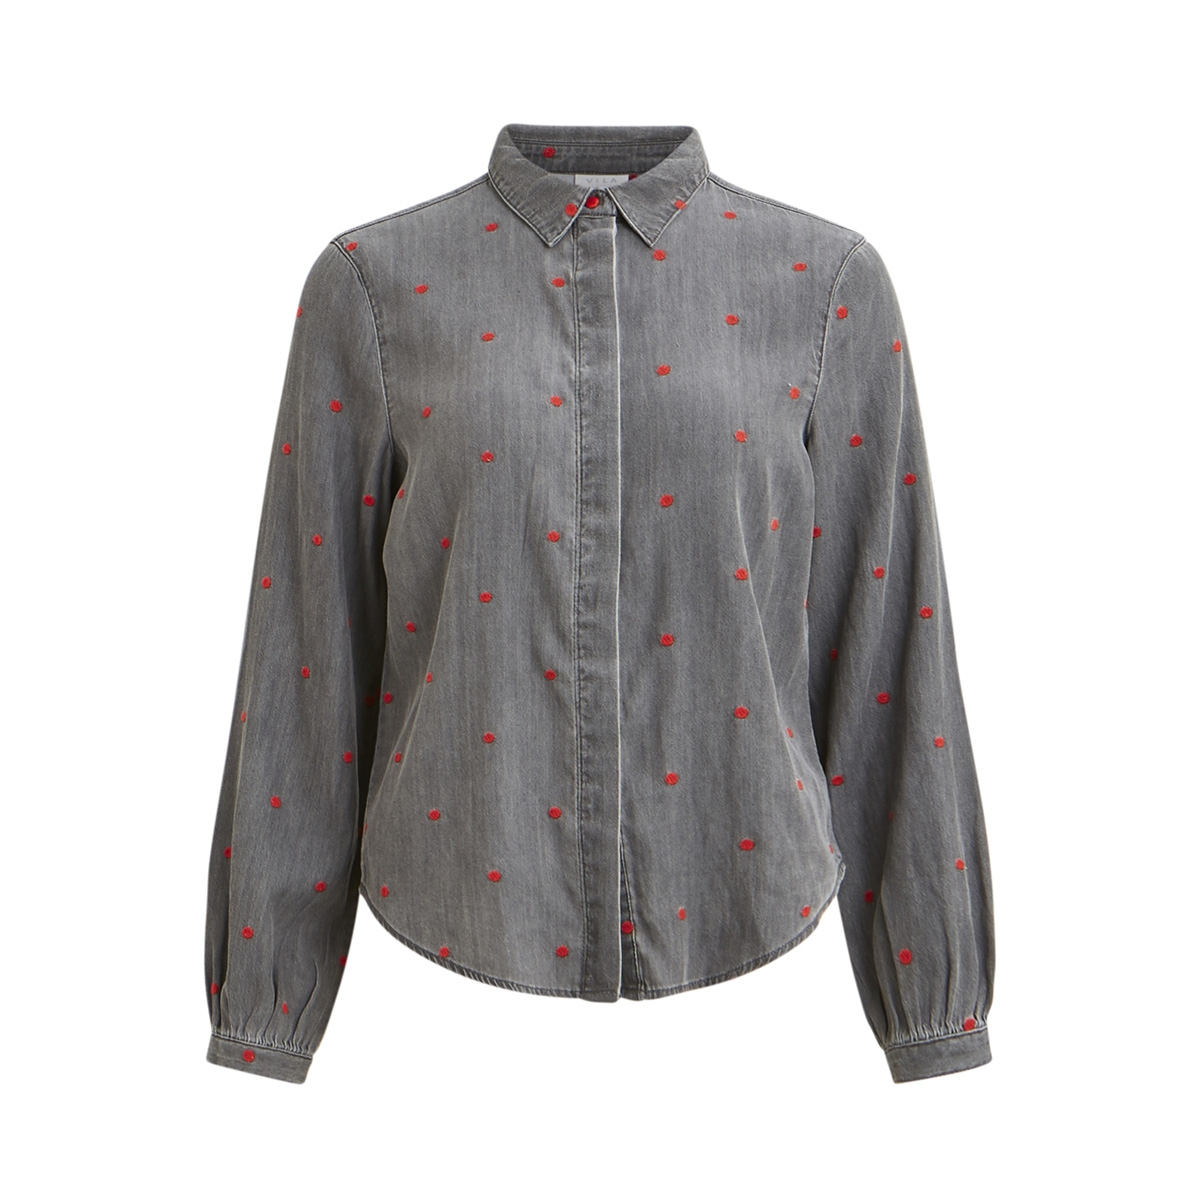 vibista ls dotted shirt 14050347 vila blouse grey denim/dots cherr